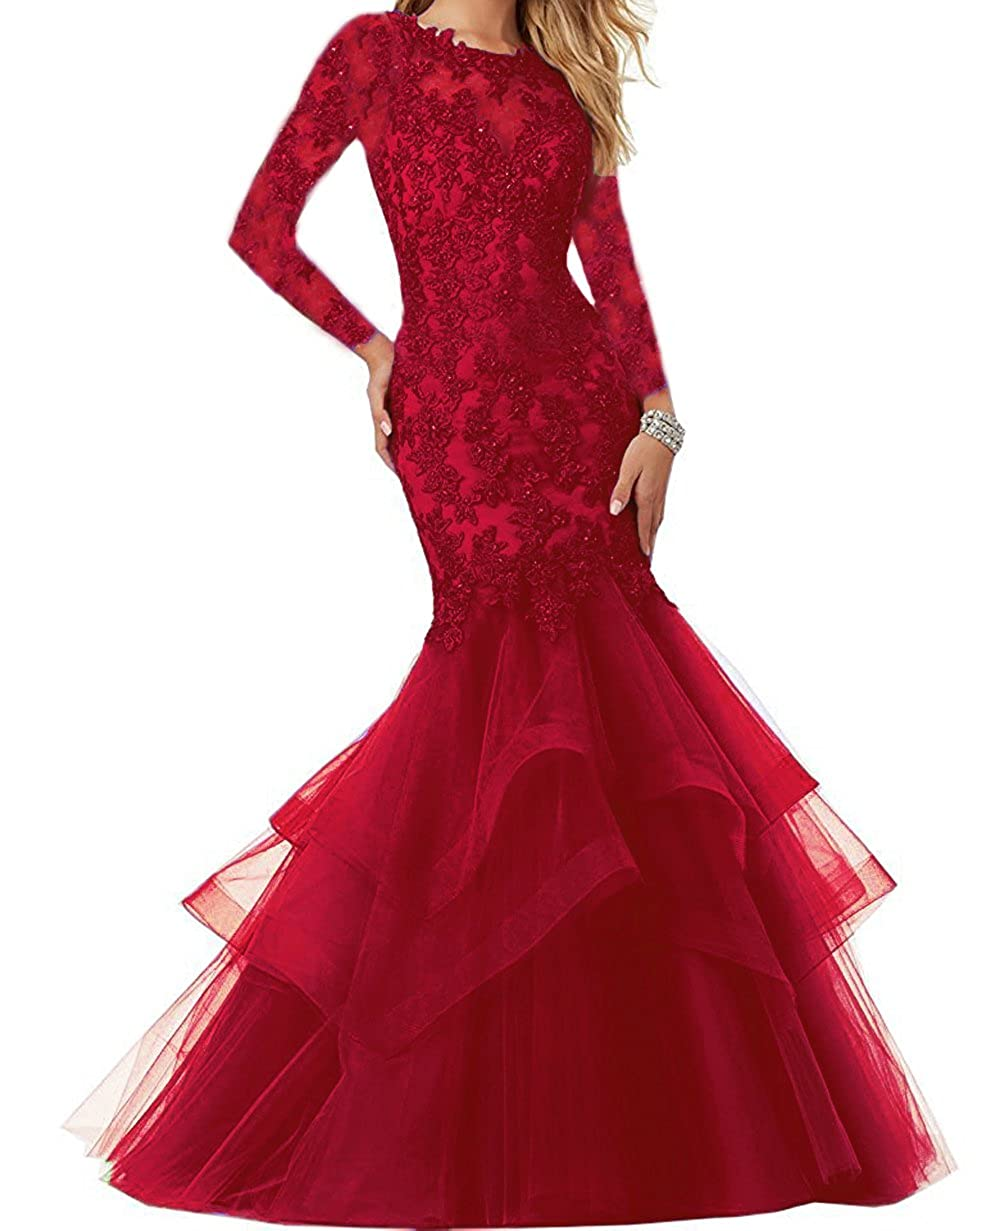 Light Burgundy Ellenhouse Women's Long Sleeve Mermaid Applique Prom Party Evening Dresses EL339